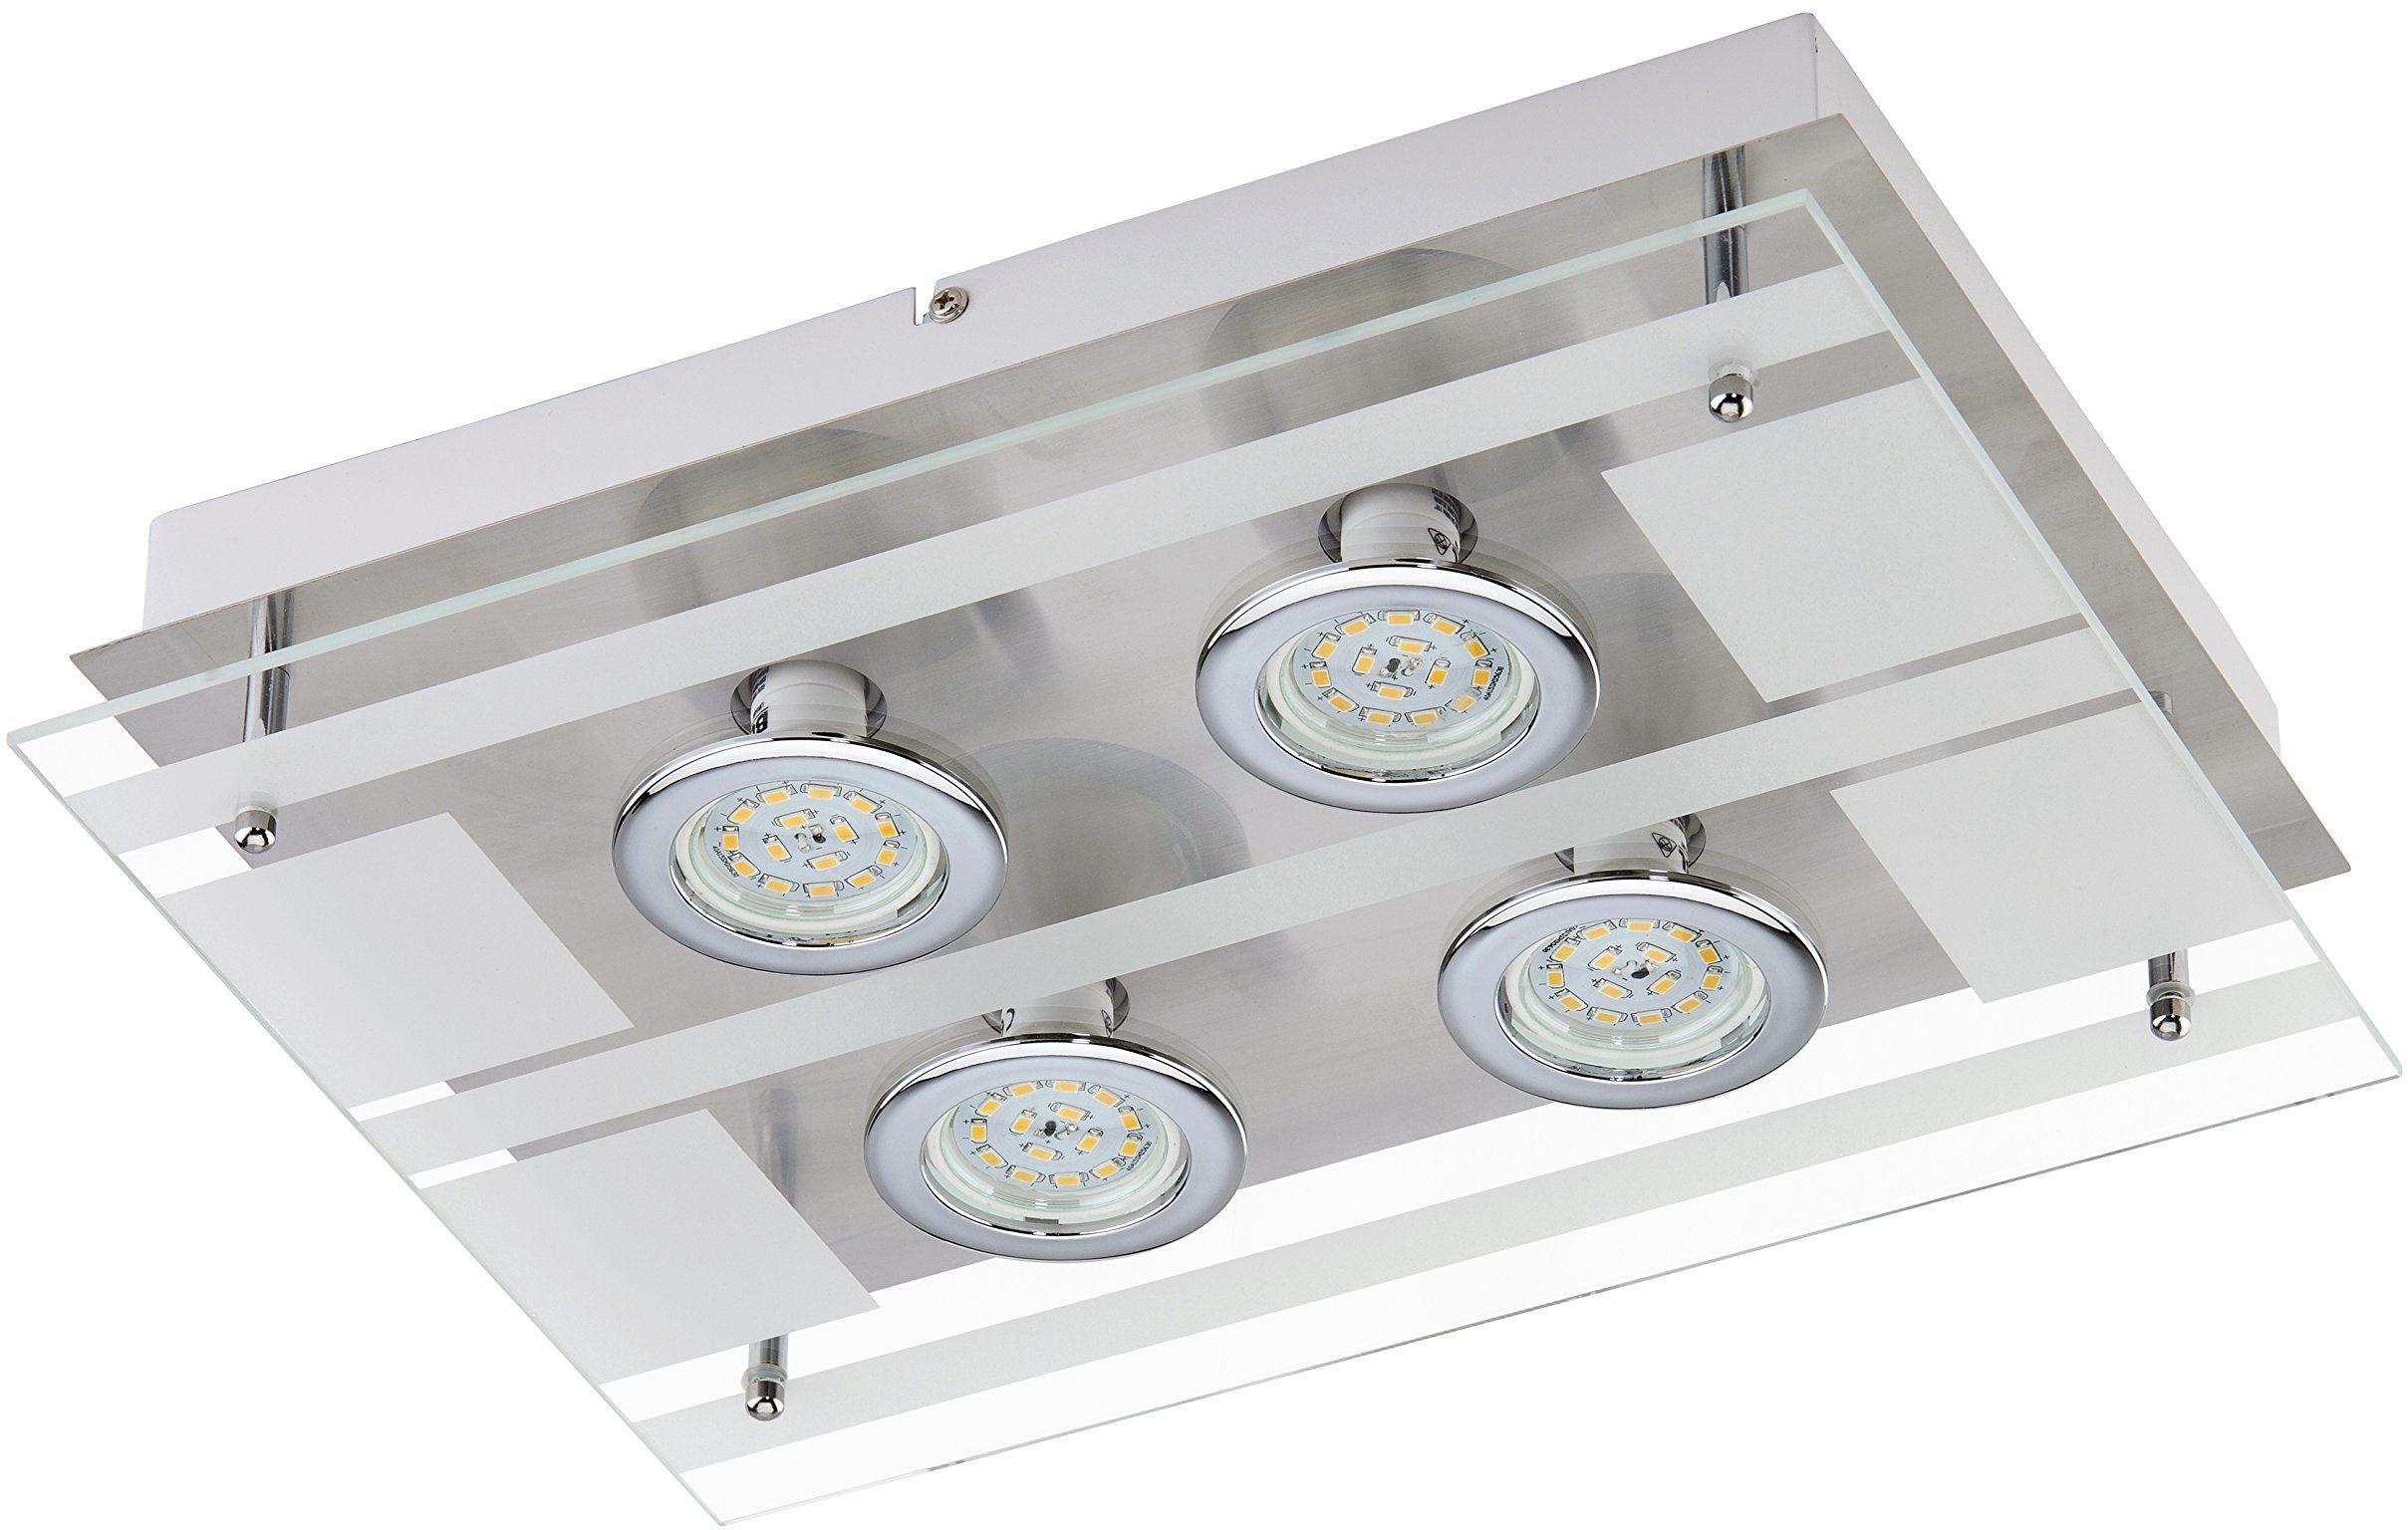 Briloner Leuchten Lampa ścienna LED 4 x 5 W, 400 lm, matowy nikiel 3552-042